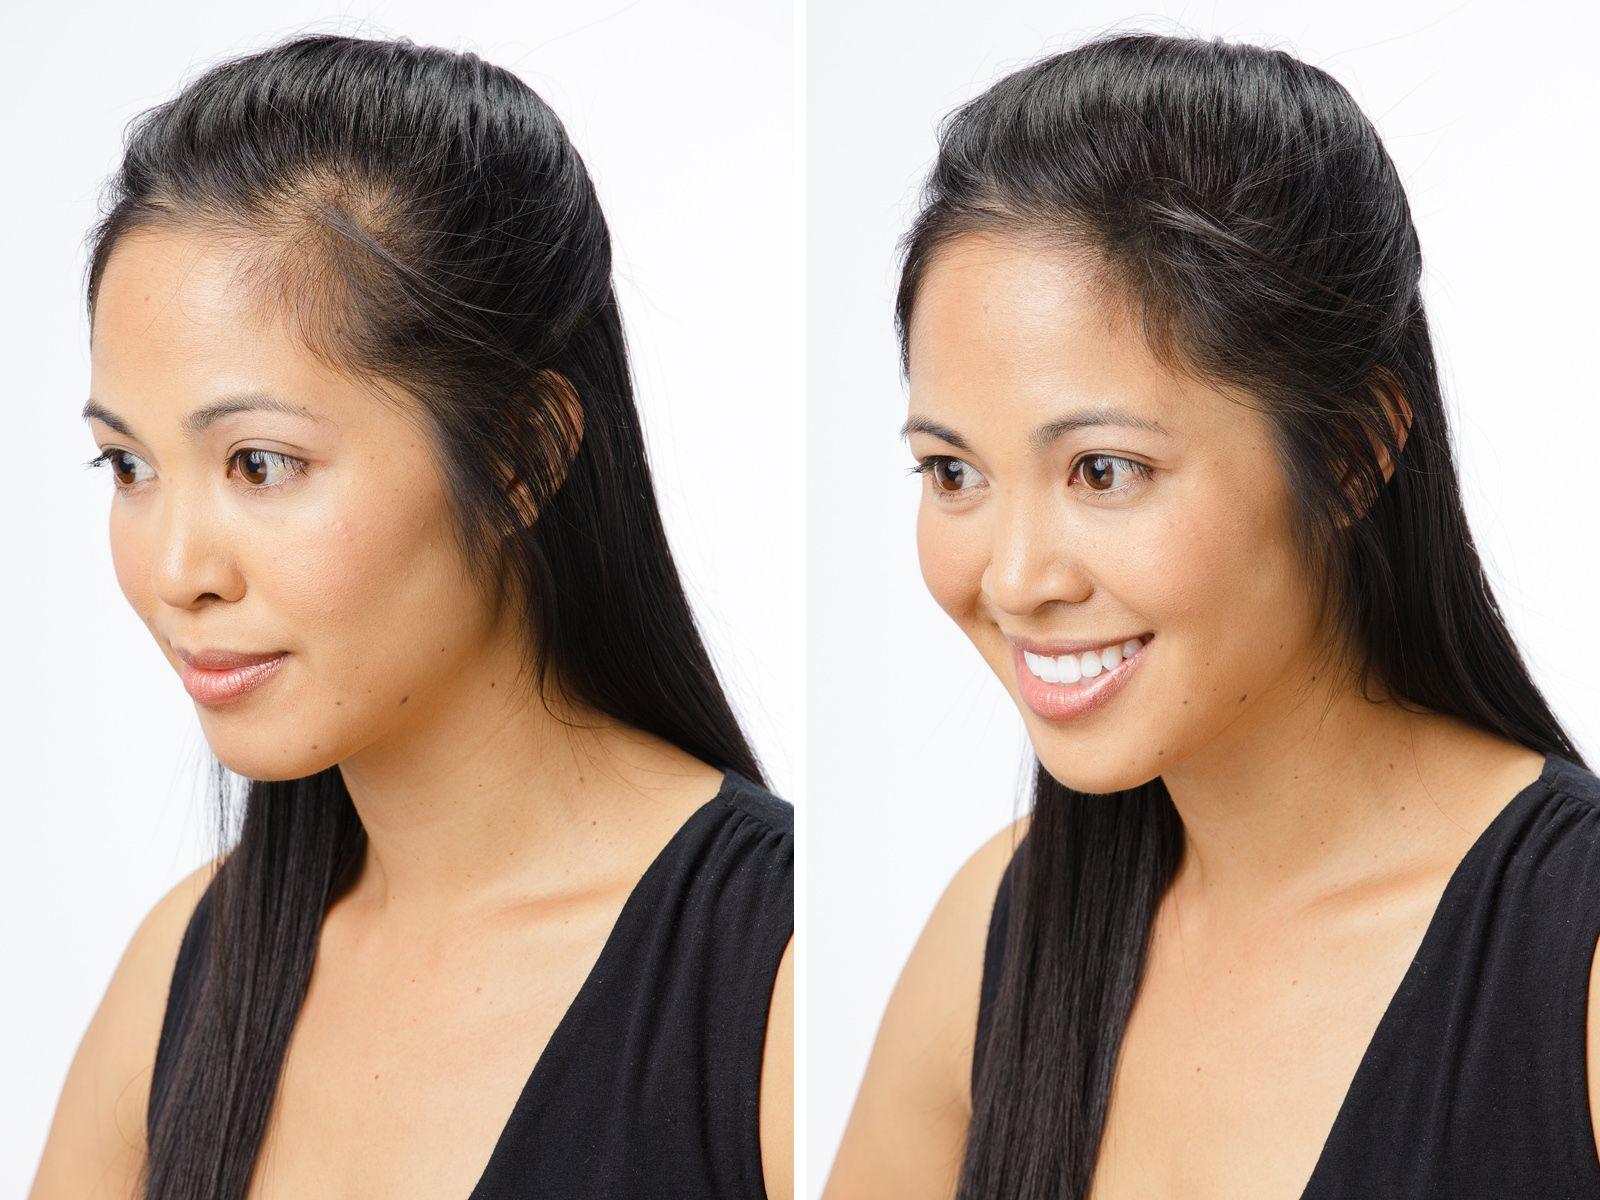 Hair Restoration From